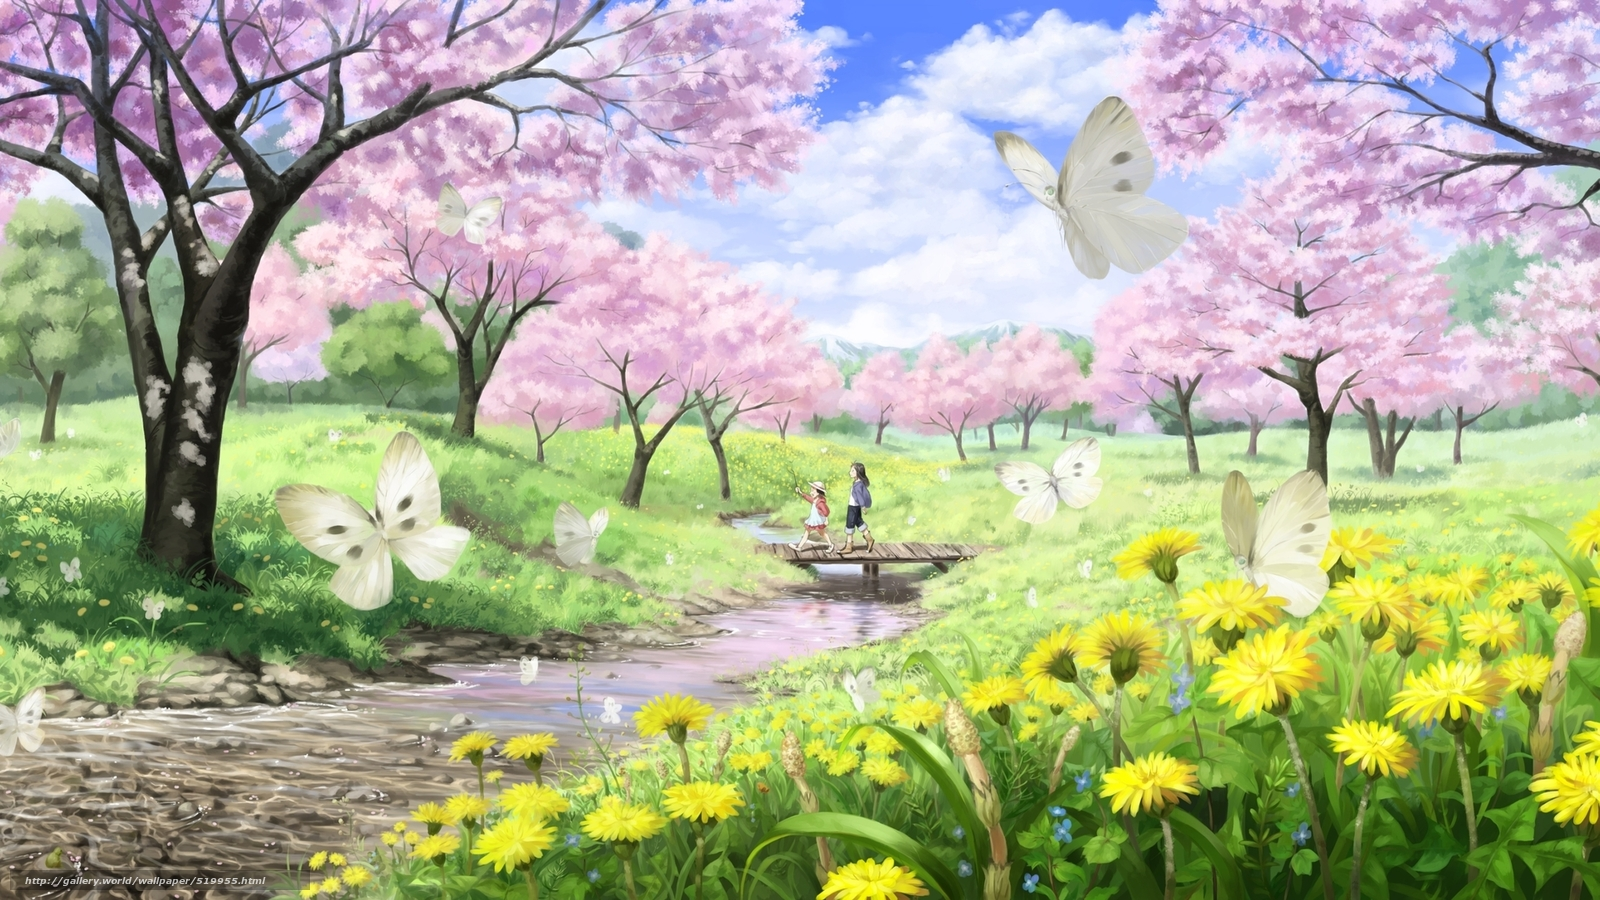 scenery wallpaper fond d 39 cran paysage printemps gratuit. Black Bedroom Furniture Sets. Home Design Ideas